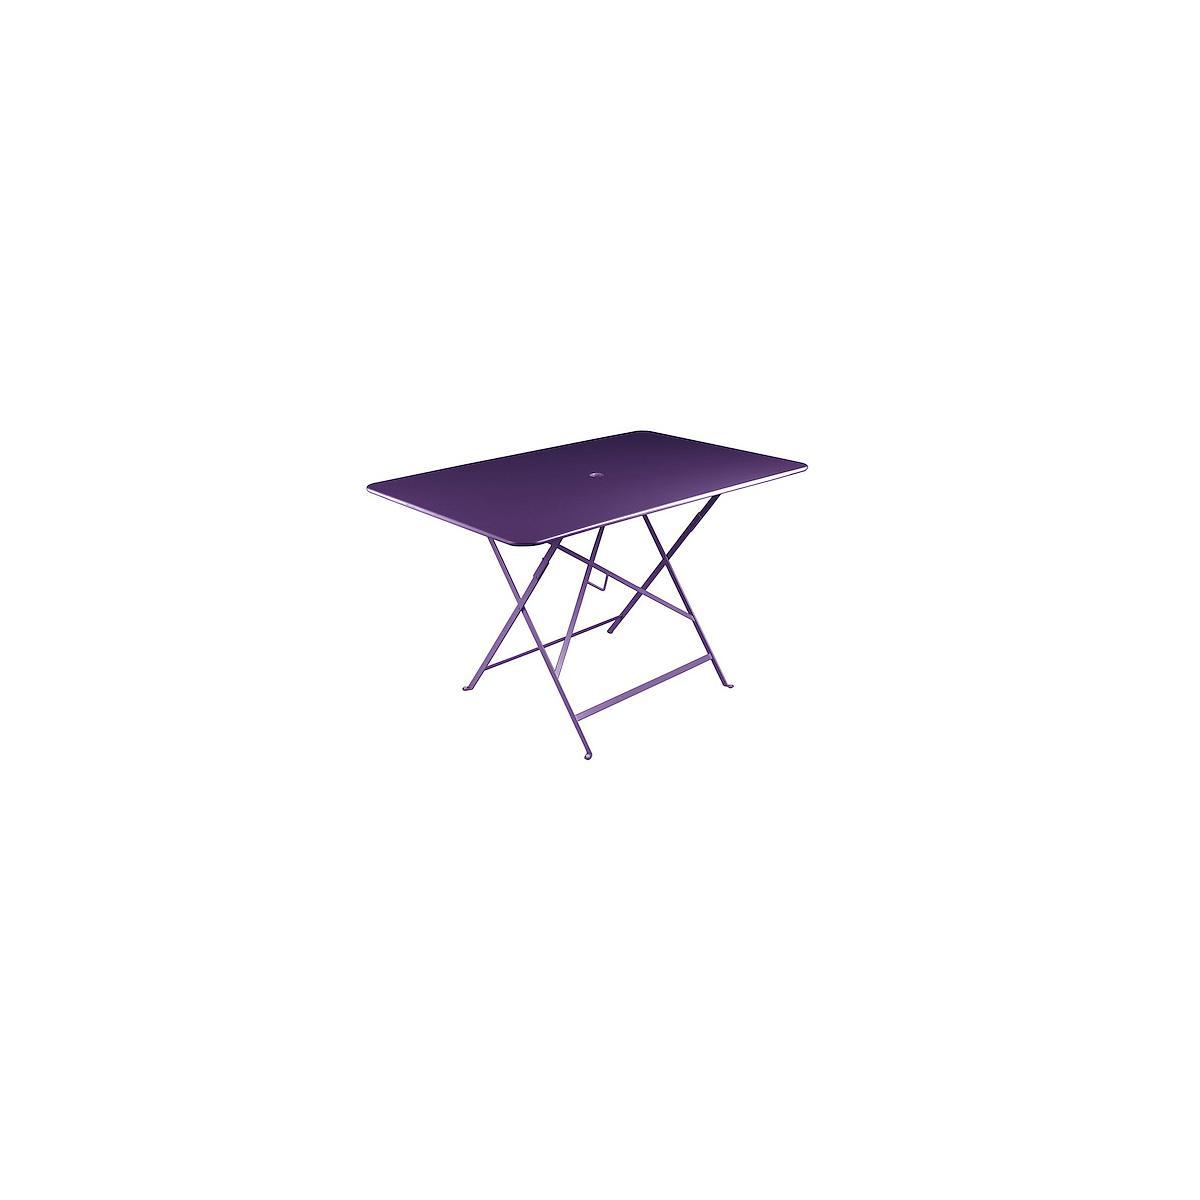 BISTRO by Fermob Table 117x77 cm Aubergine